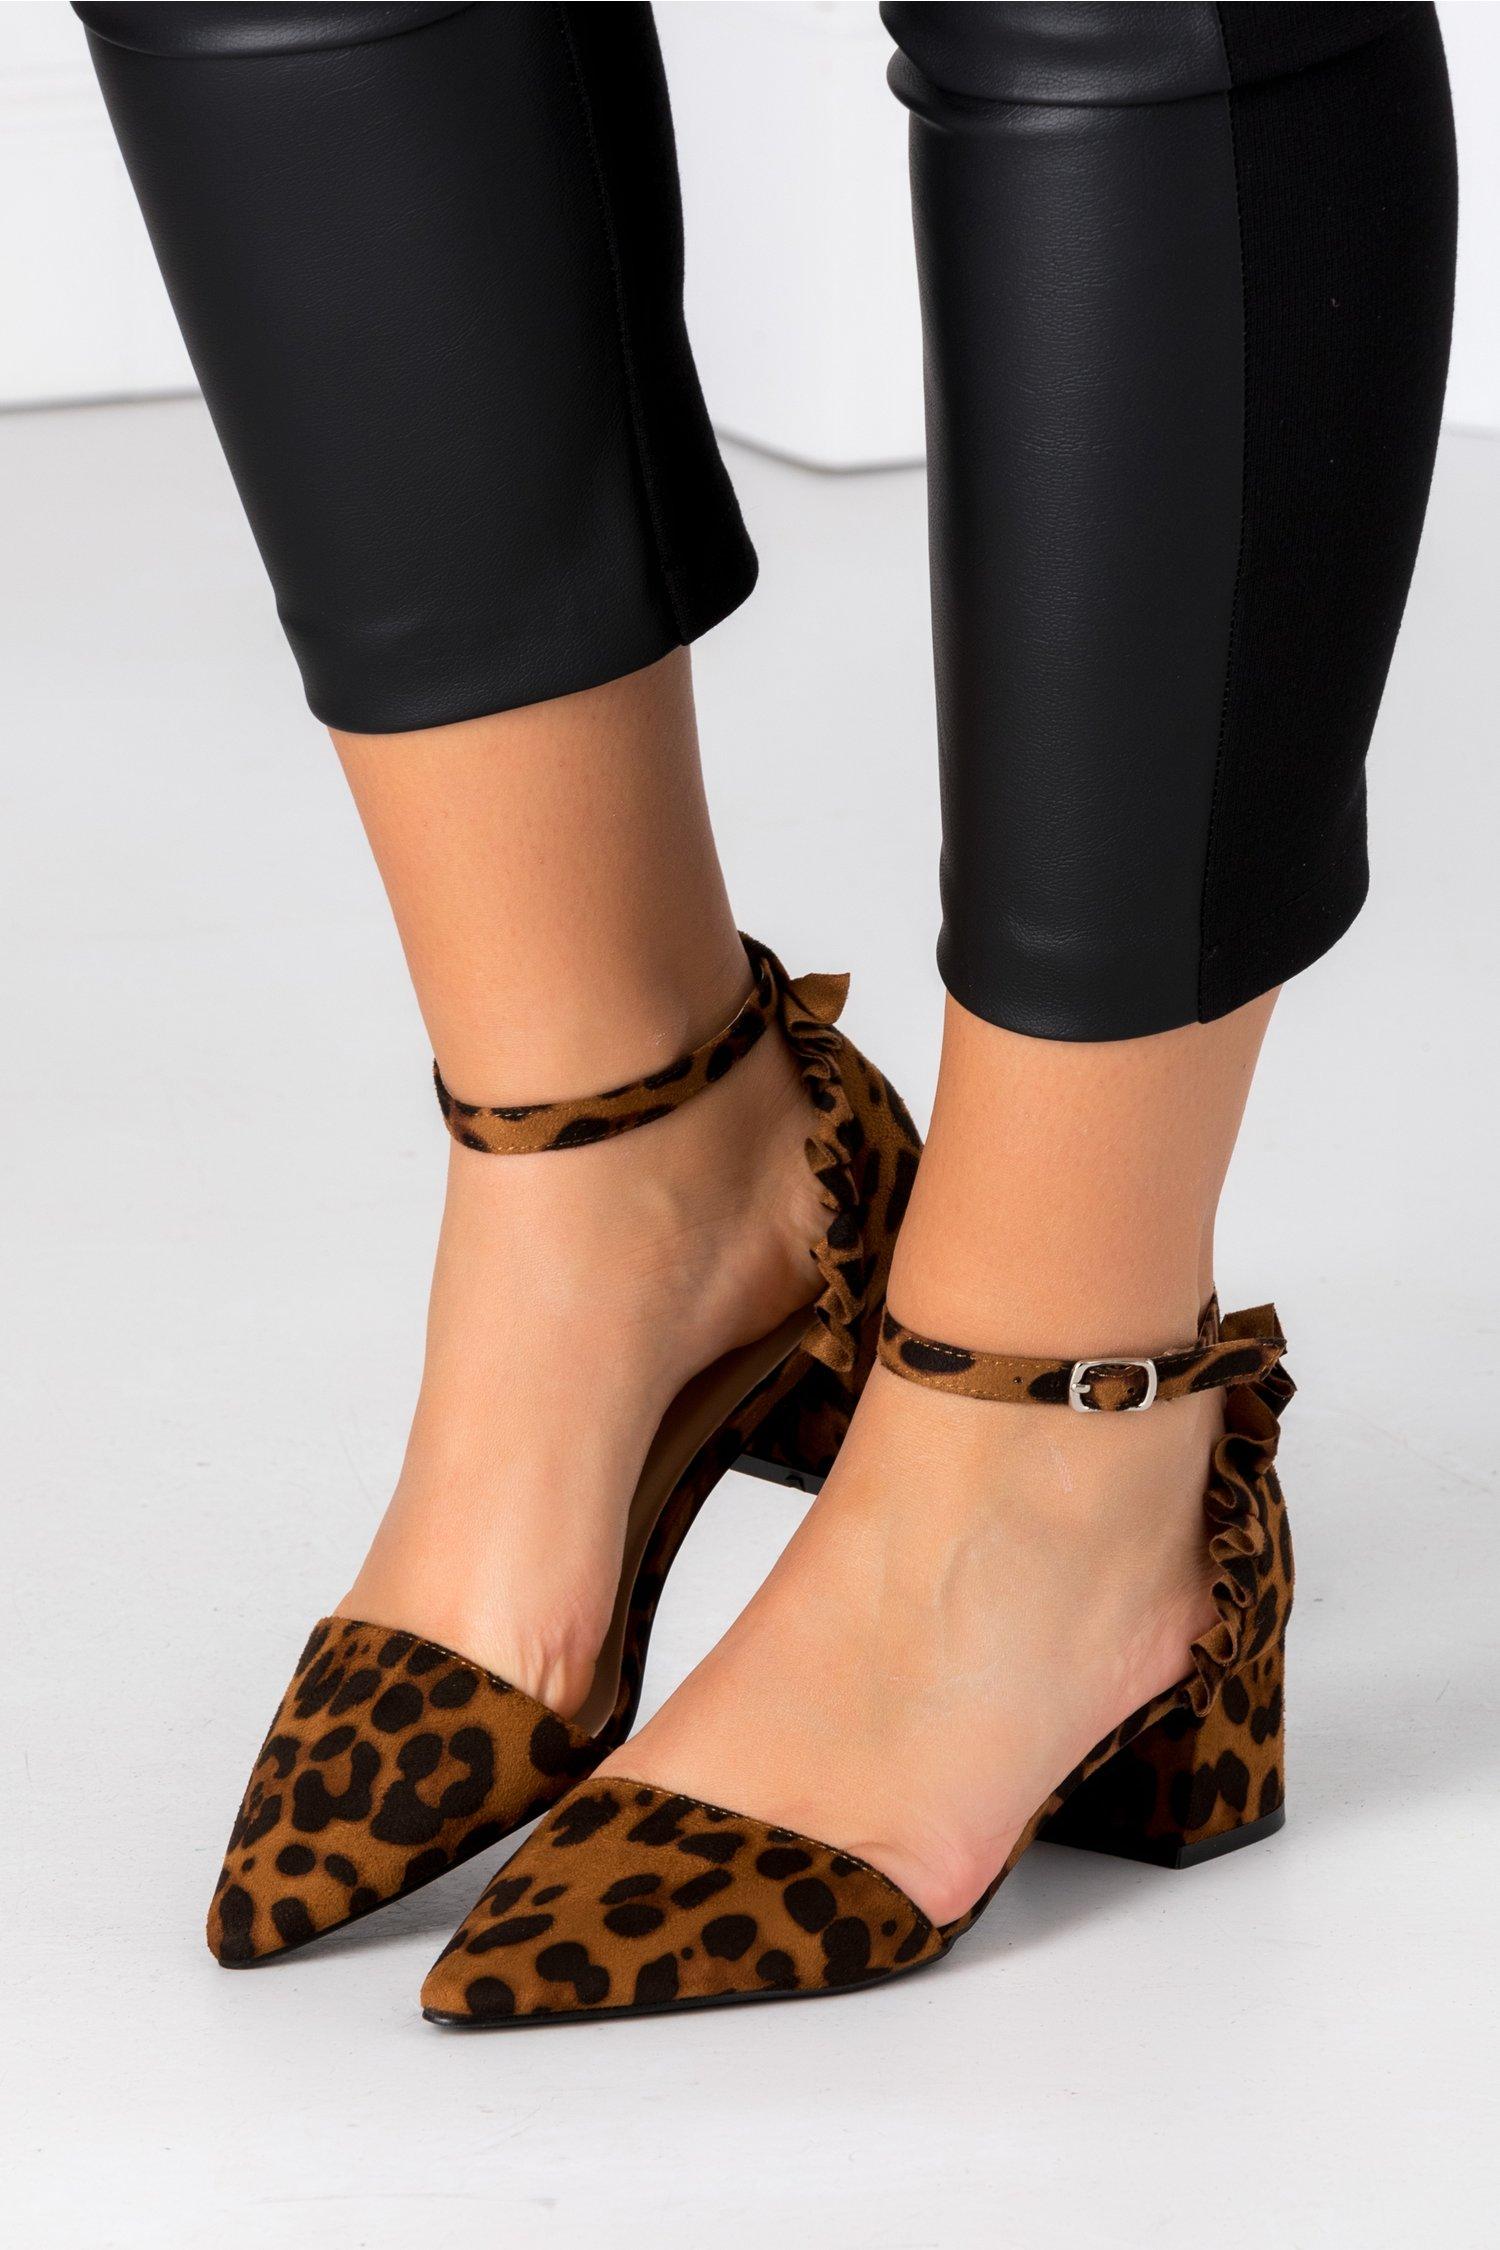 Pantofi Alegra maro animal print cu volanase la spate